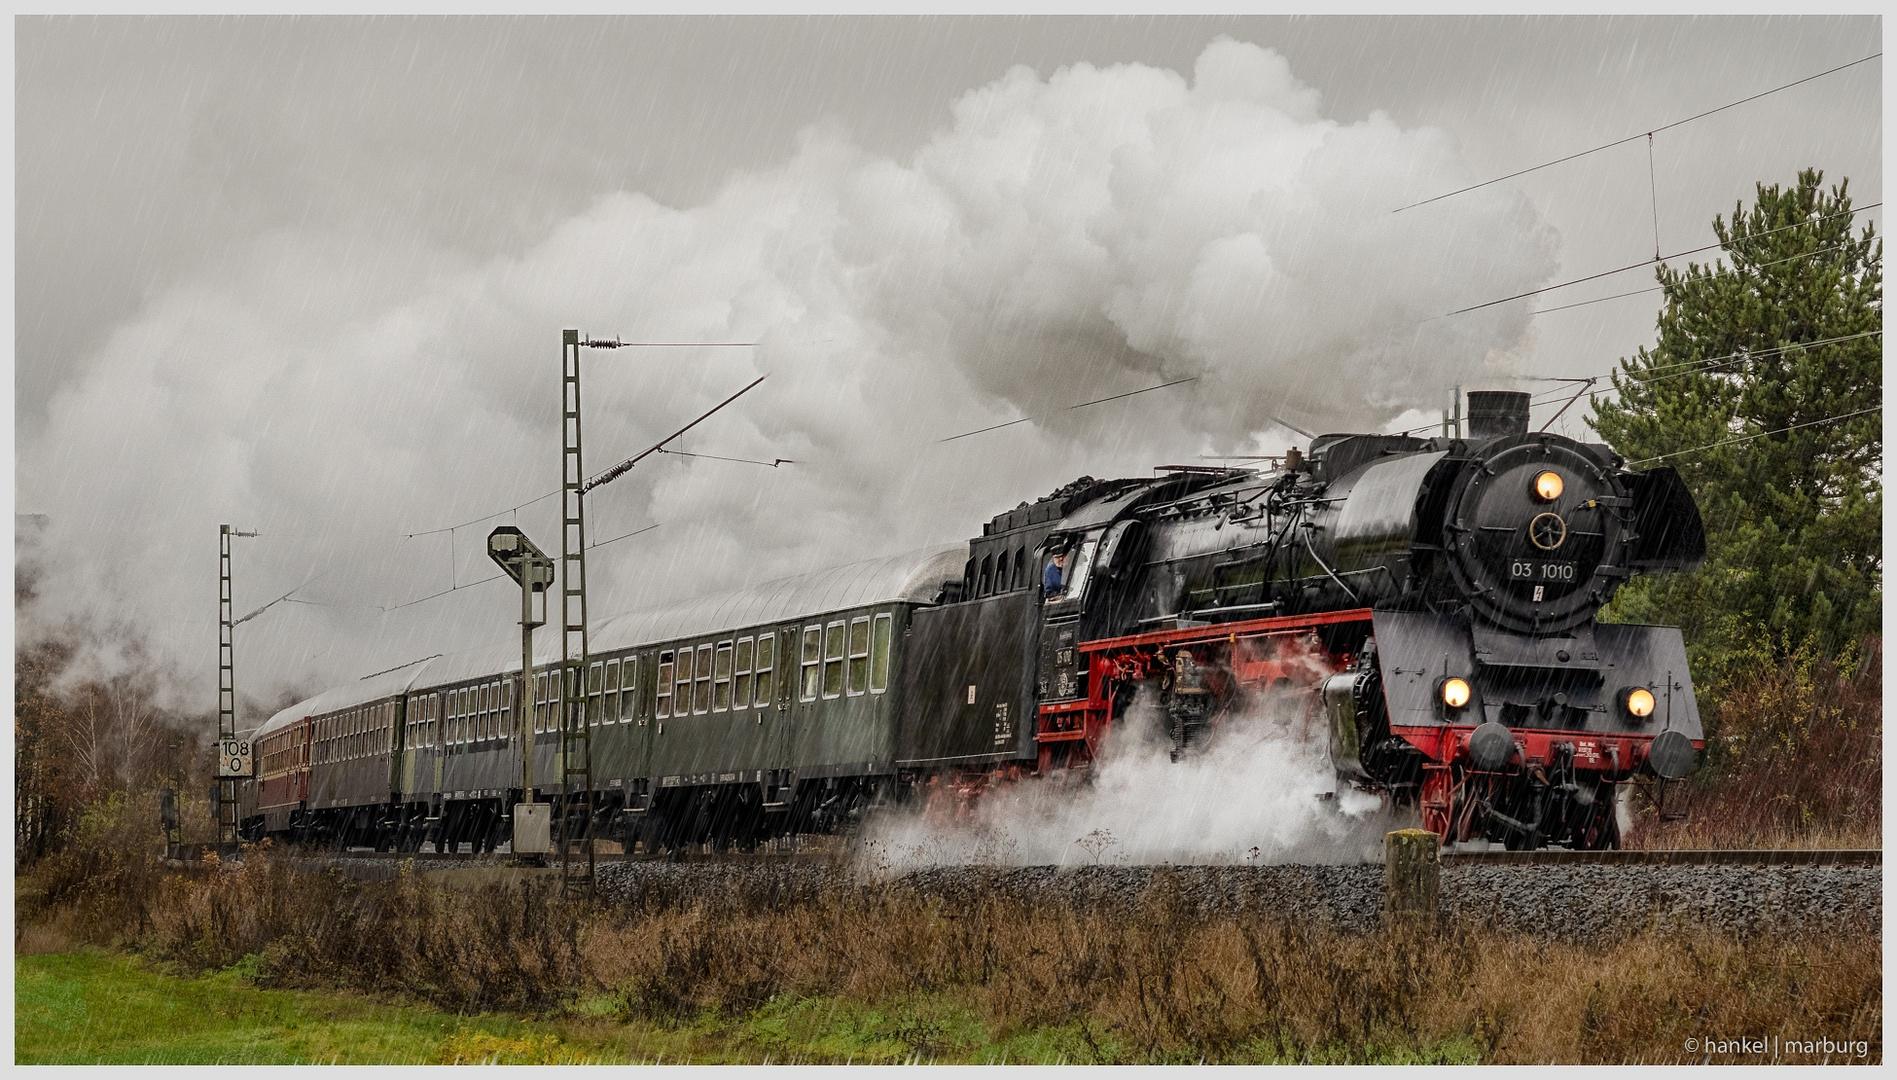 Zweite Nikolausfahrt der Eisenbahnfreunde Treysa e.V